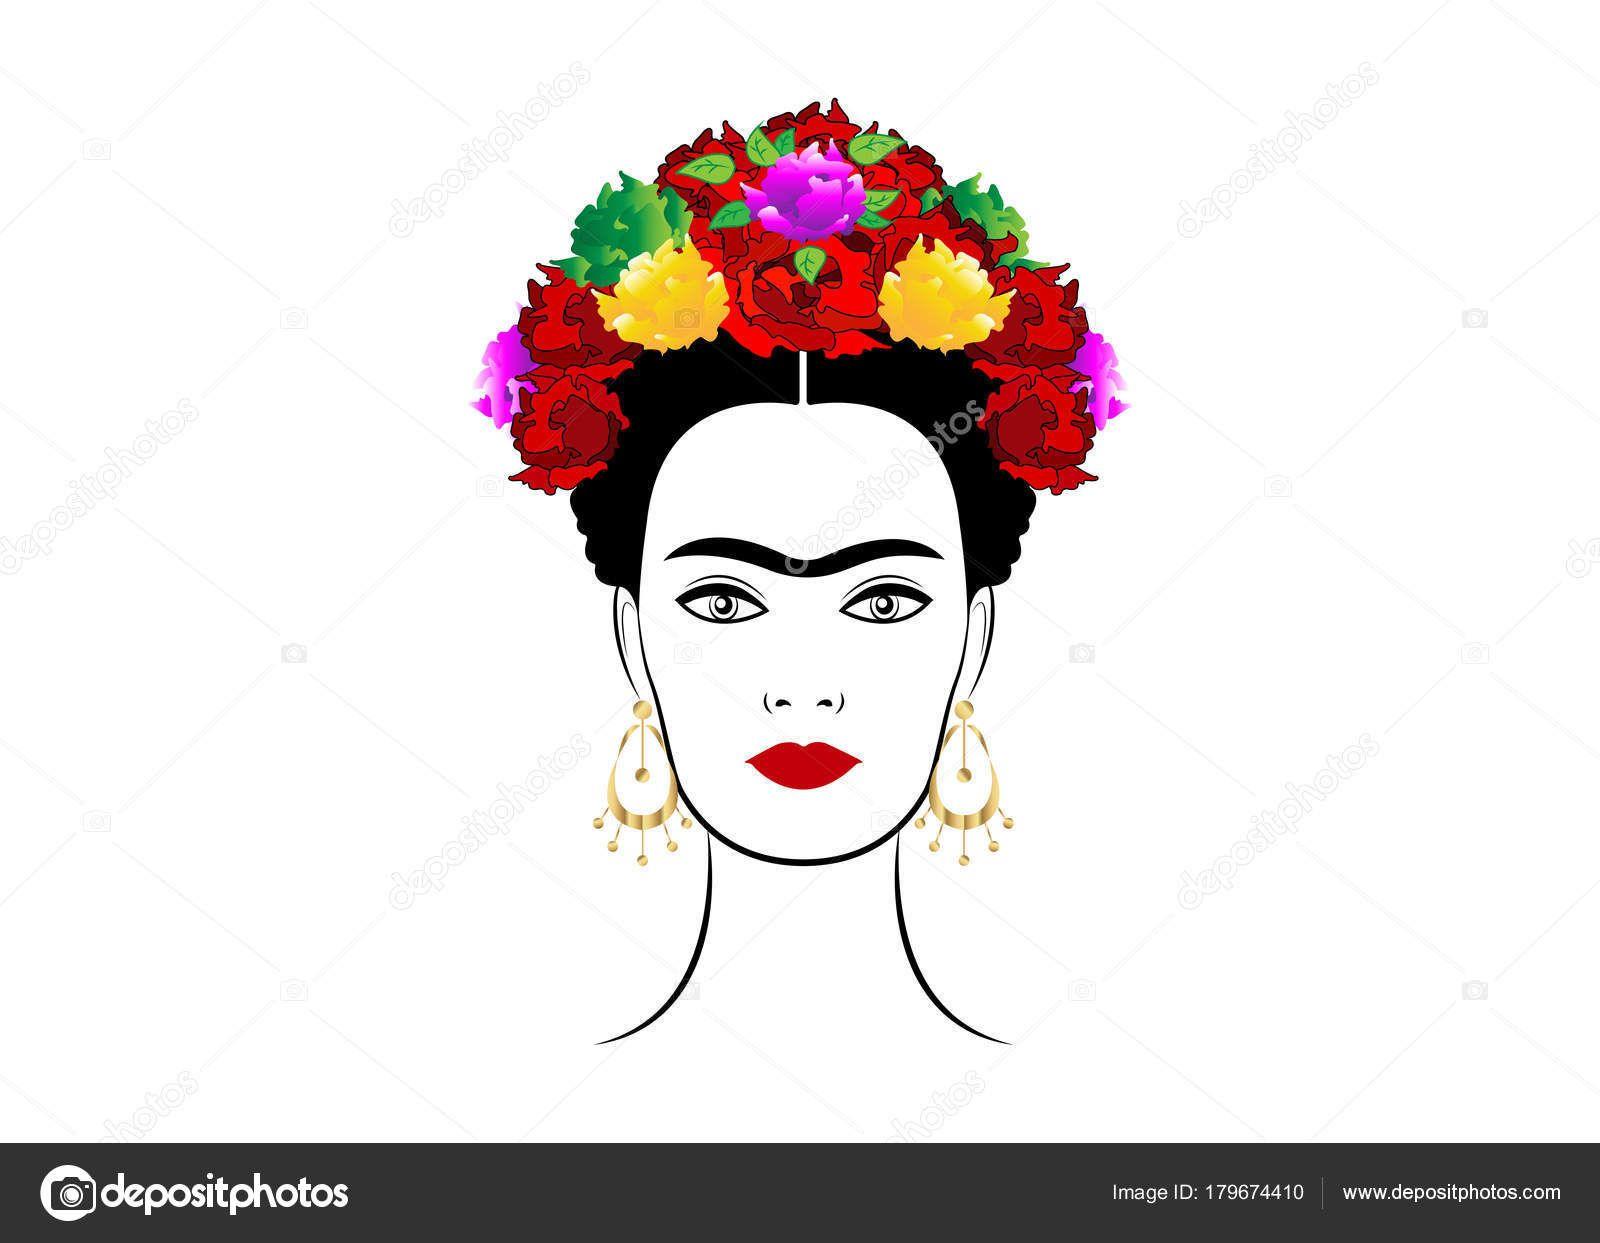 d318ee0d1c Descargar - Retrato de Frida Kahlo vector